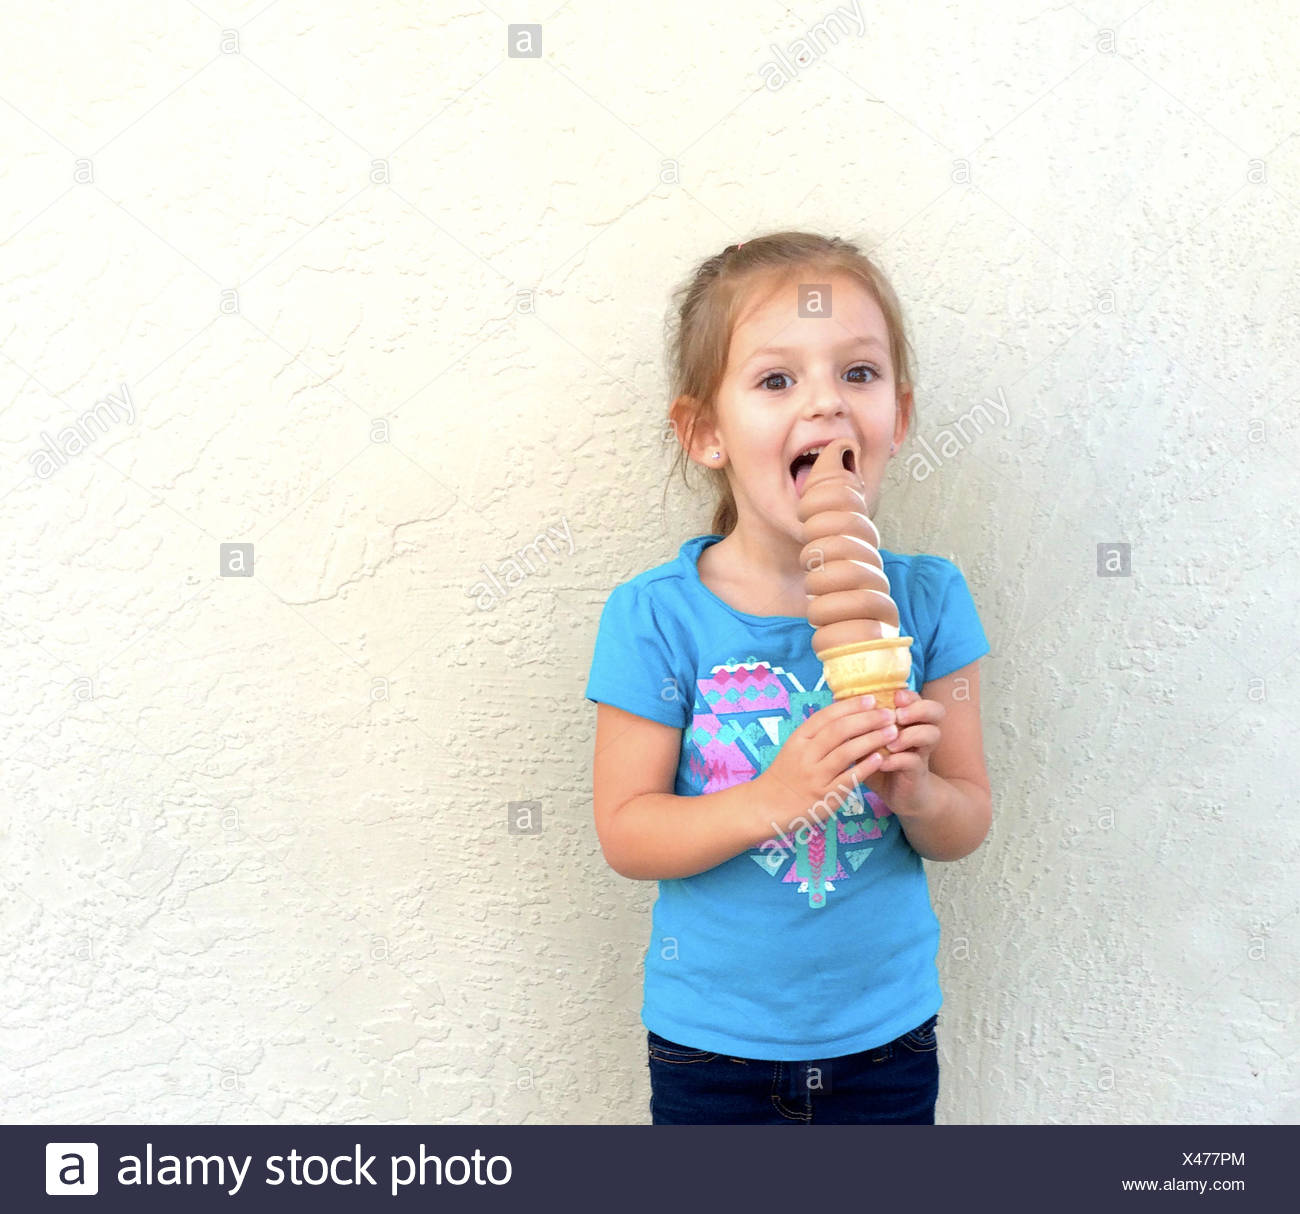 Girl (4-5) with ice cream cone - Stock Image